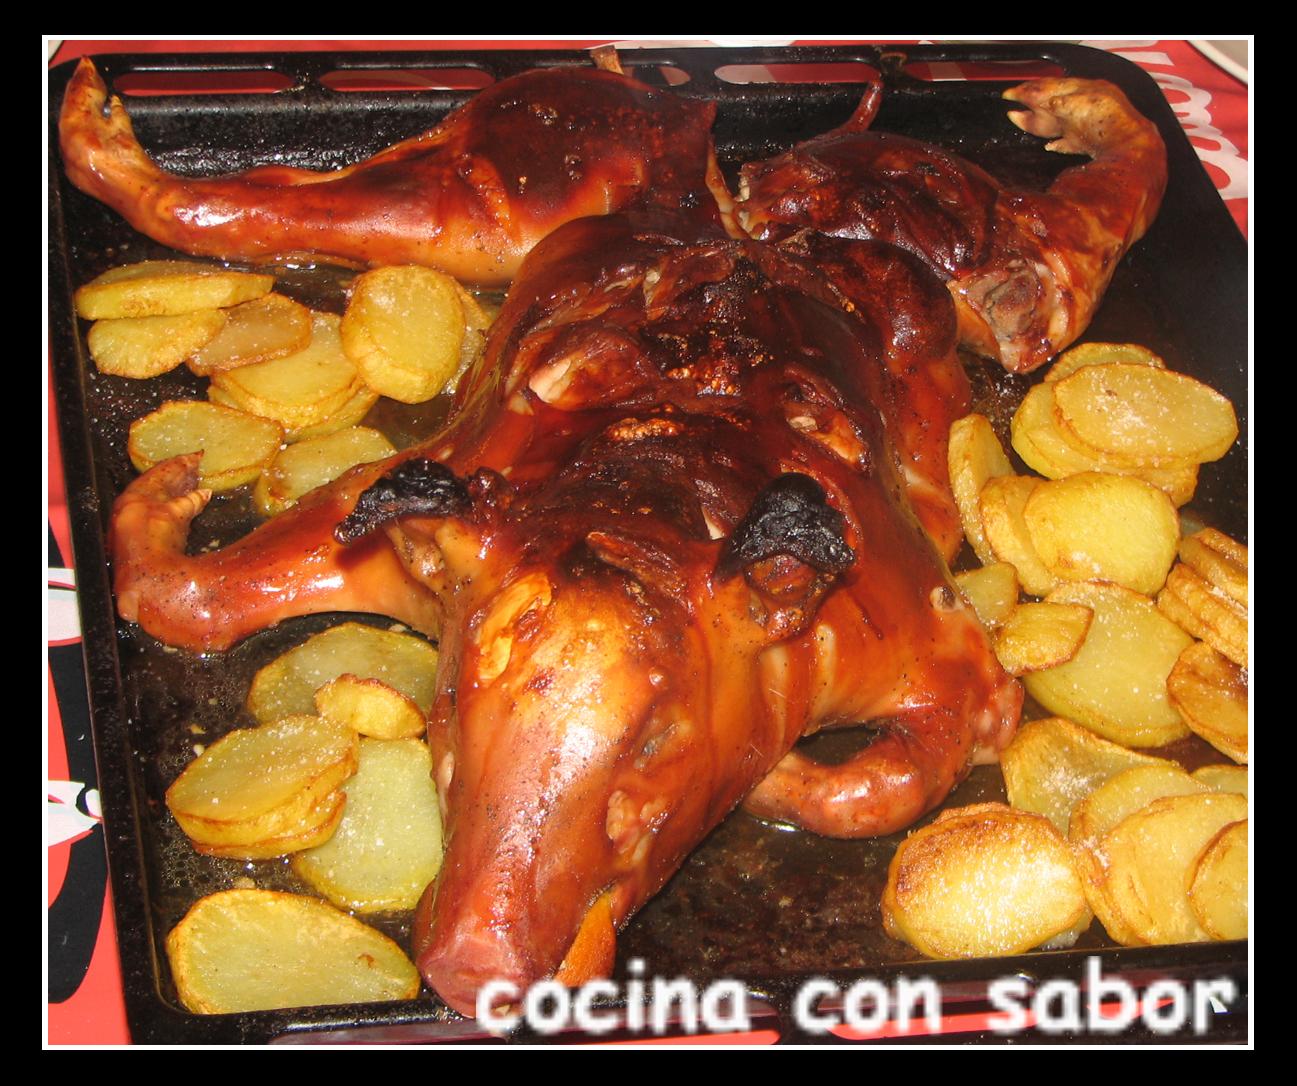 Cocina con sabor cochinillo al horno - Cocina al horno ...